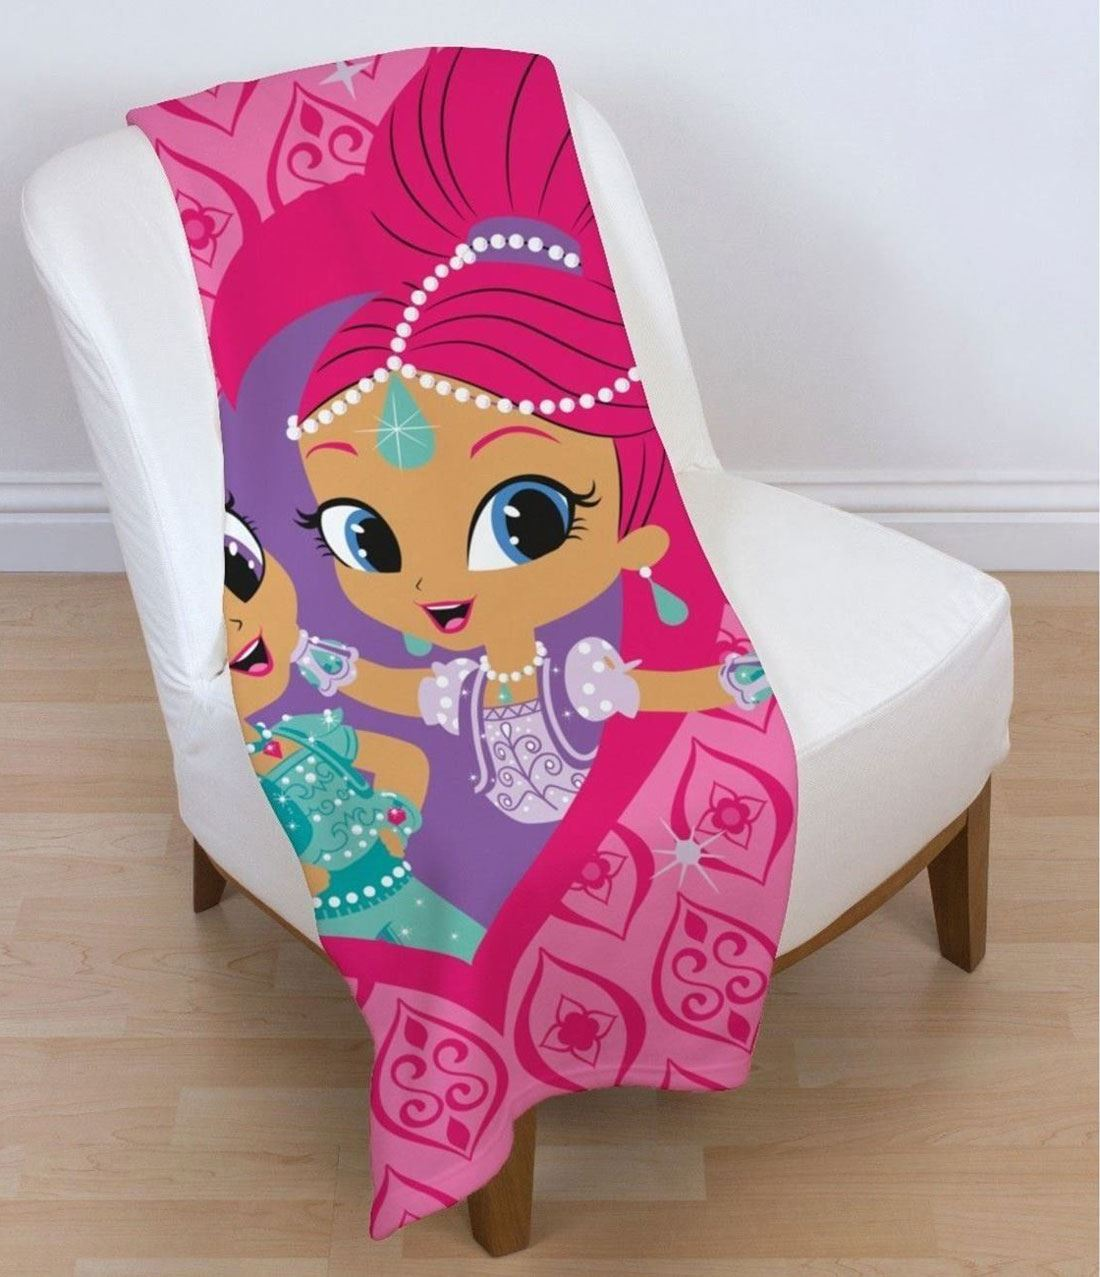 Zahramay-Shimmer-And-Shine-Kids-Warm-Soft-Comfortable-Fleece-Bedroom-Blanket thumbnail 3